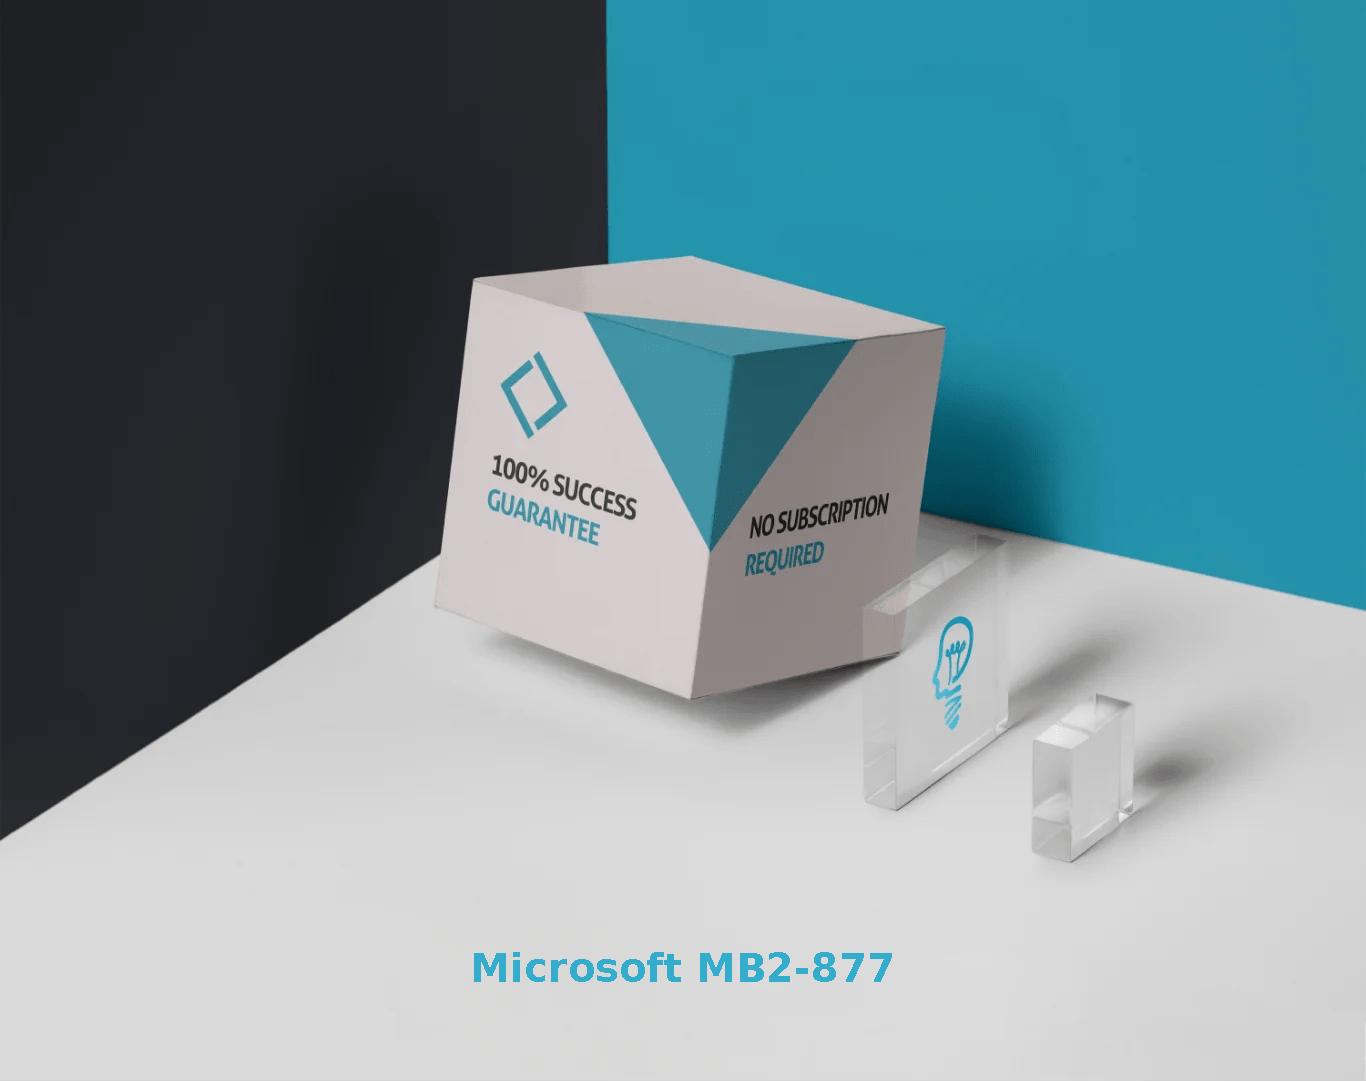 Microsoft MB2-877 Exams